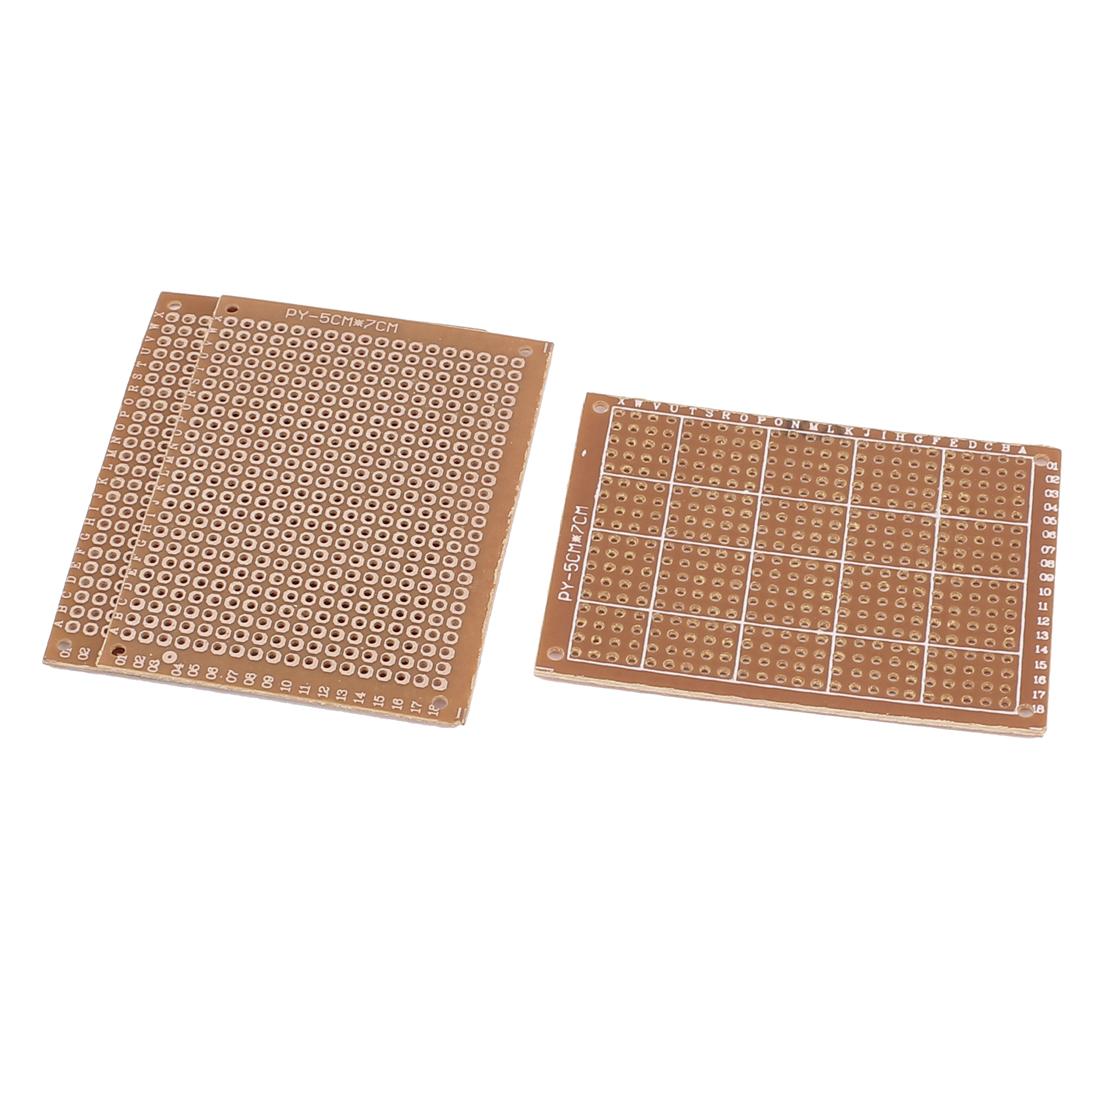 3 Pcs Prototype Universal PCB Print Circuit Board 70mm x 50mm Brass Tone